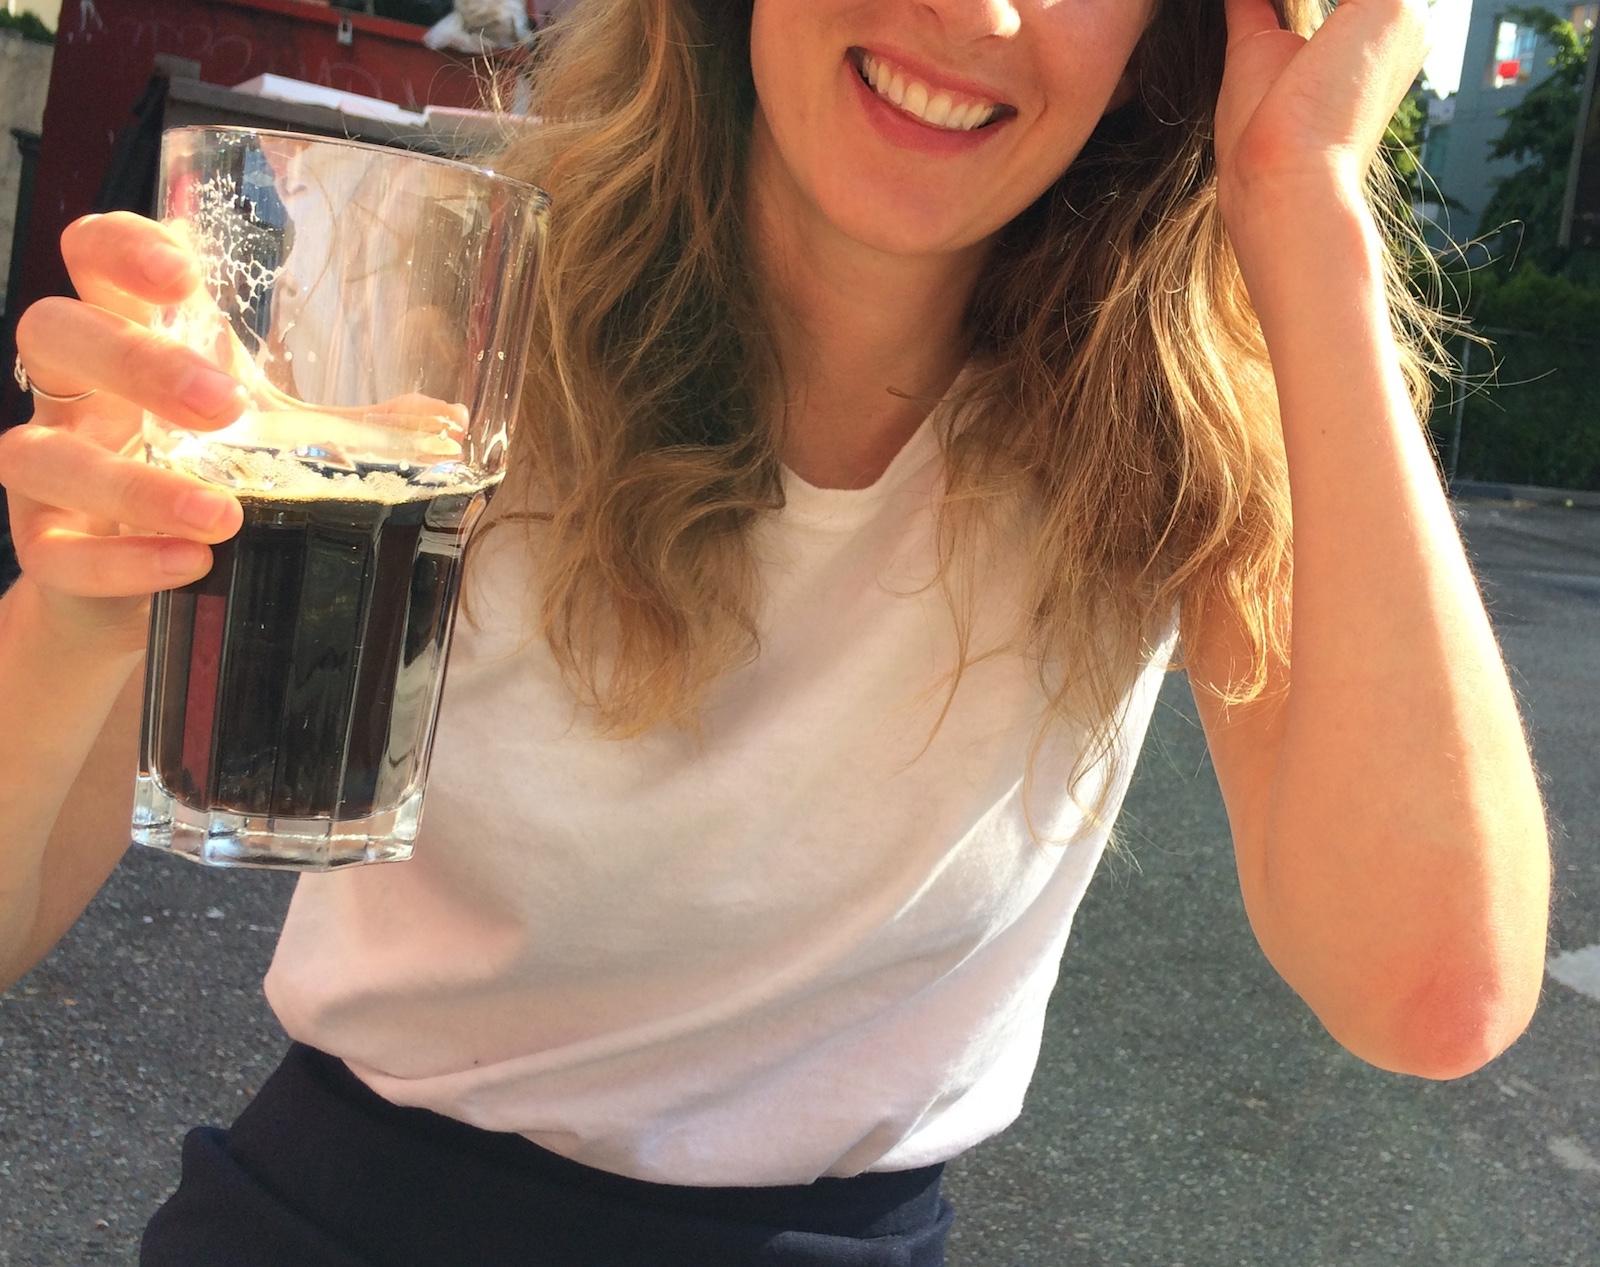 The Beer Brief, Vol. 4 photo